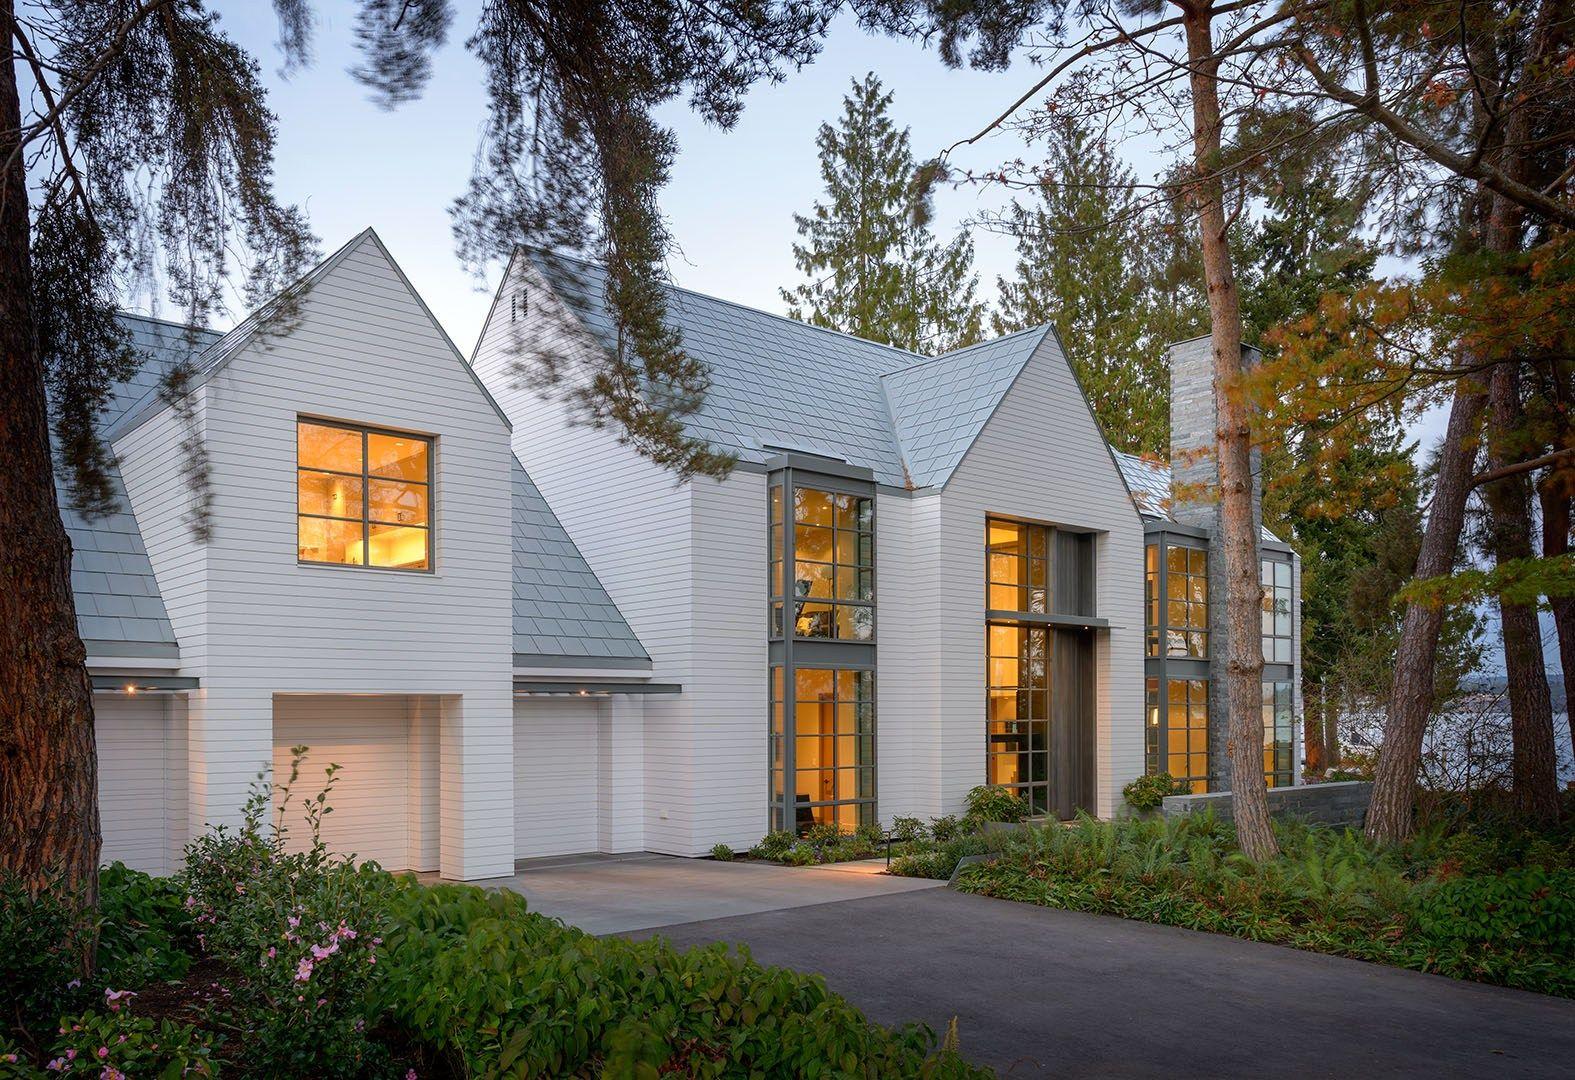 Lakefront House A contemporary interpretation of the Shingle Style ...